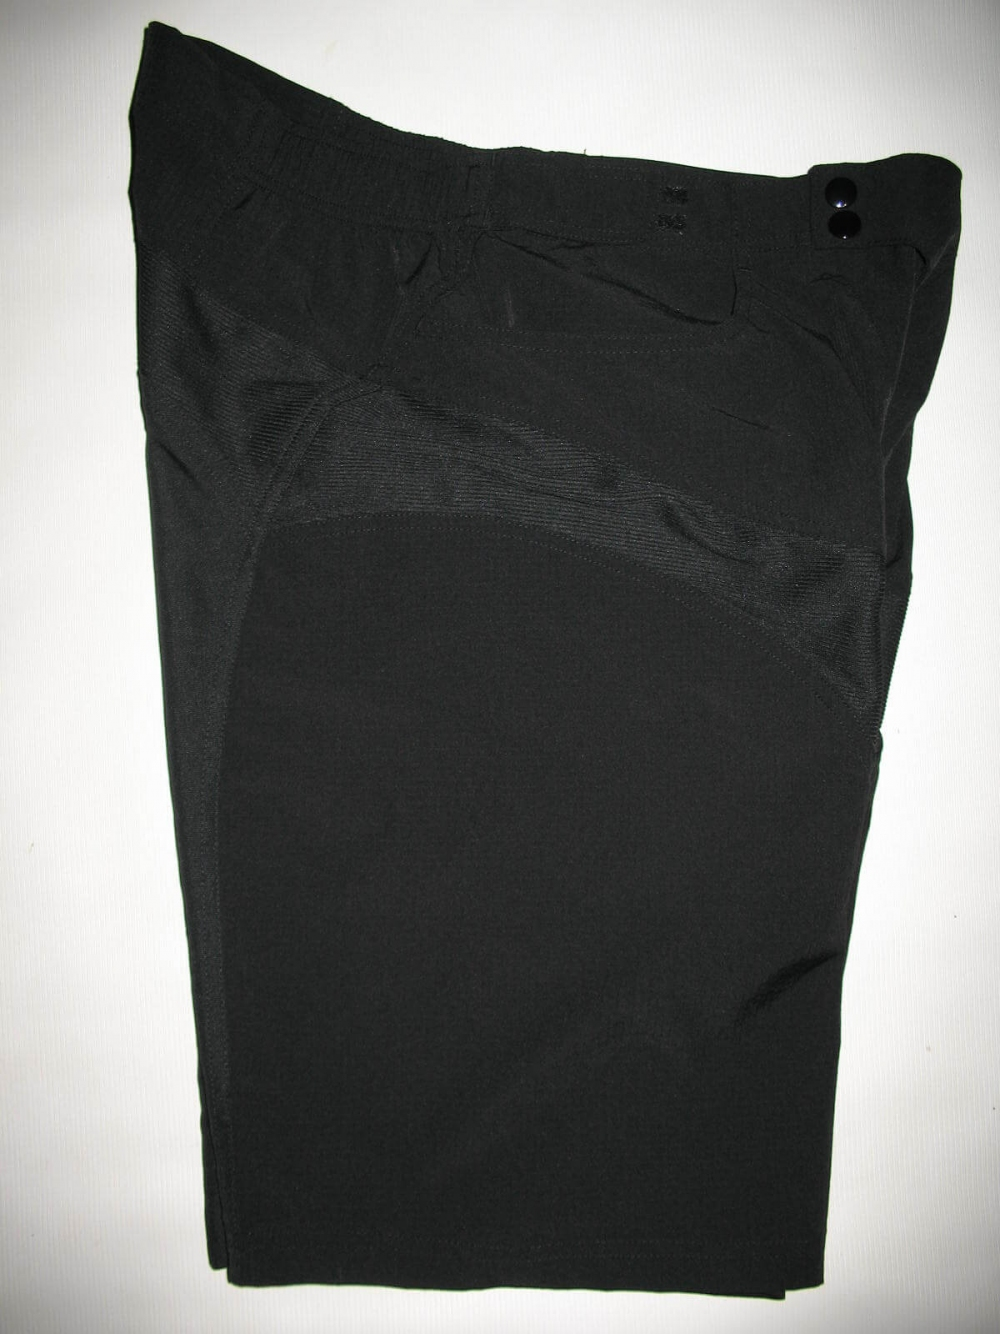 Шорты NRG trail cycling shorts (размер M) - 3